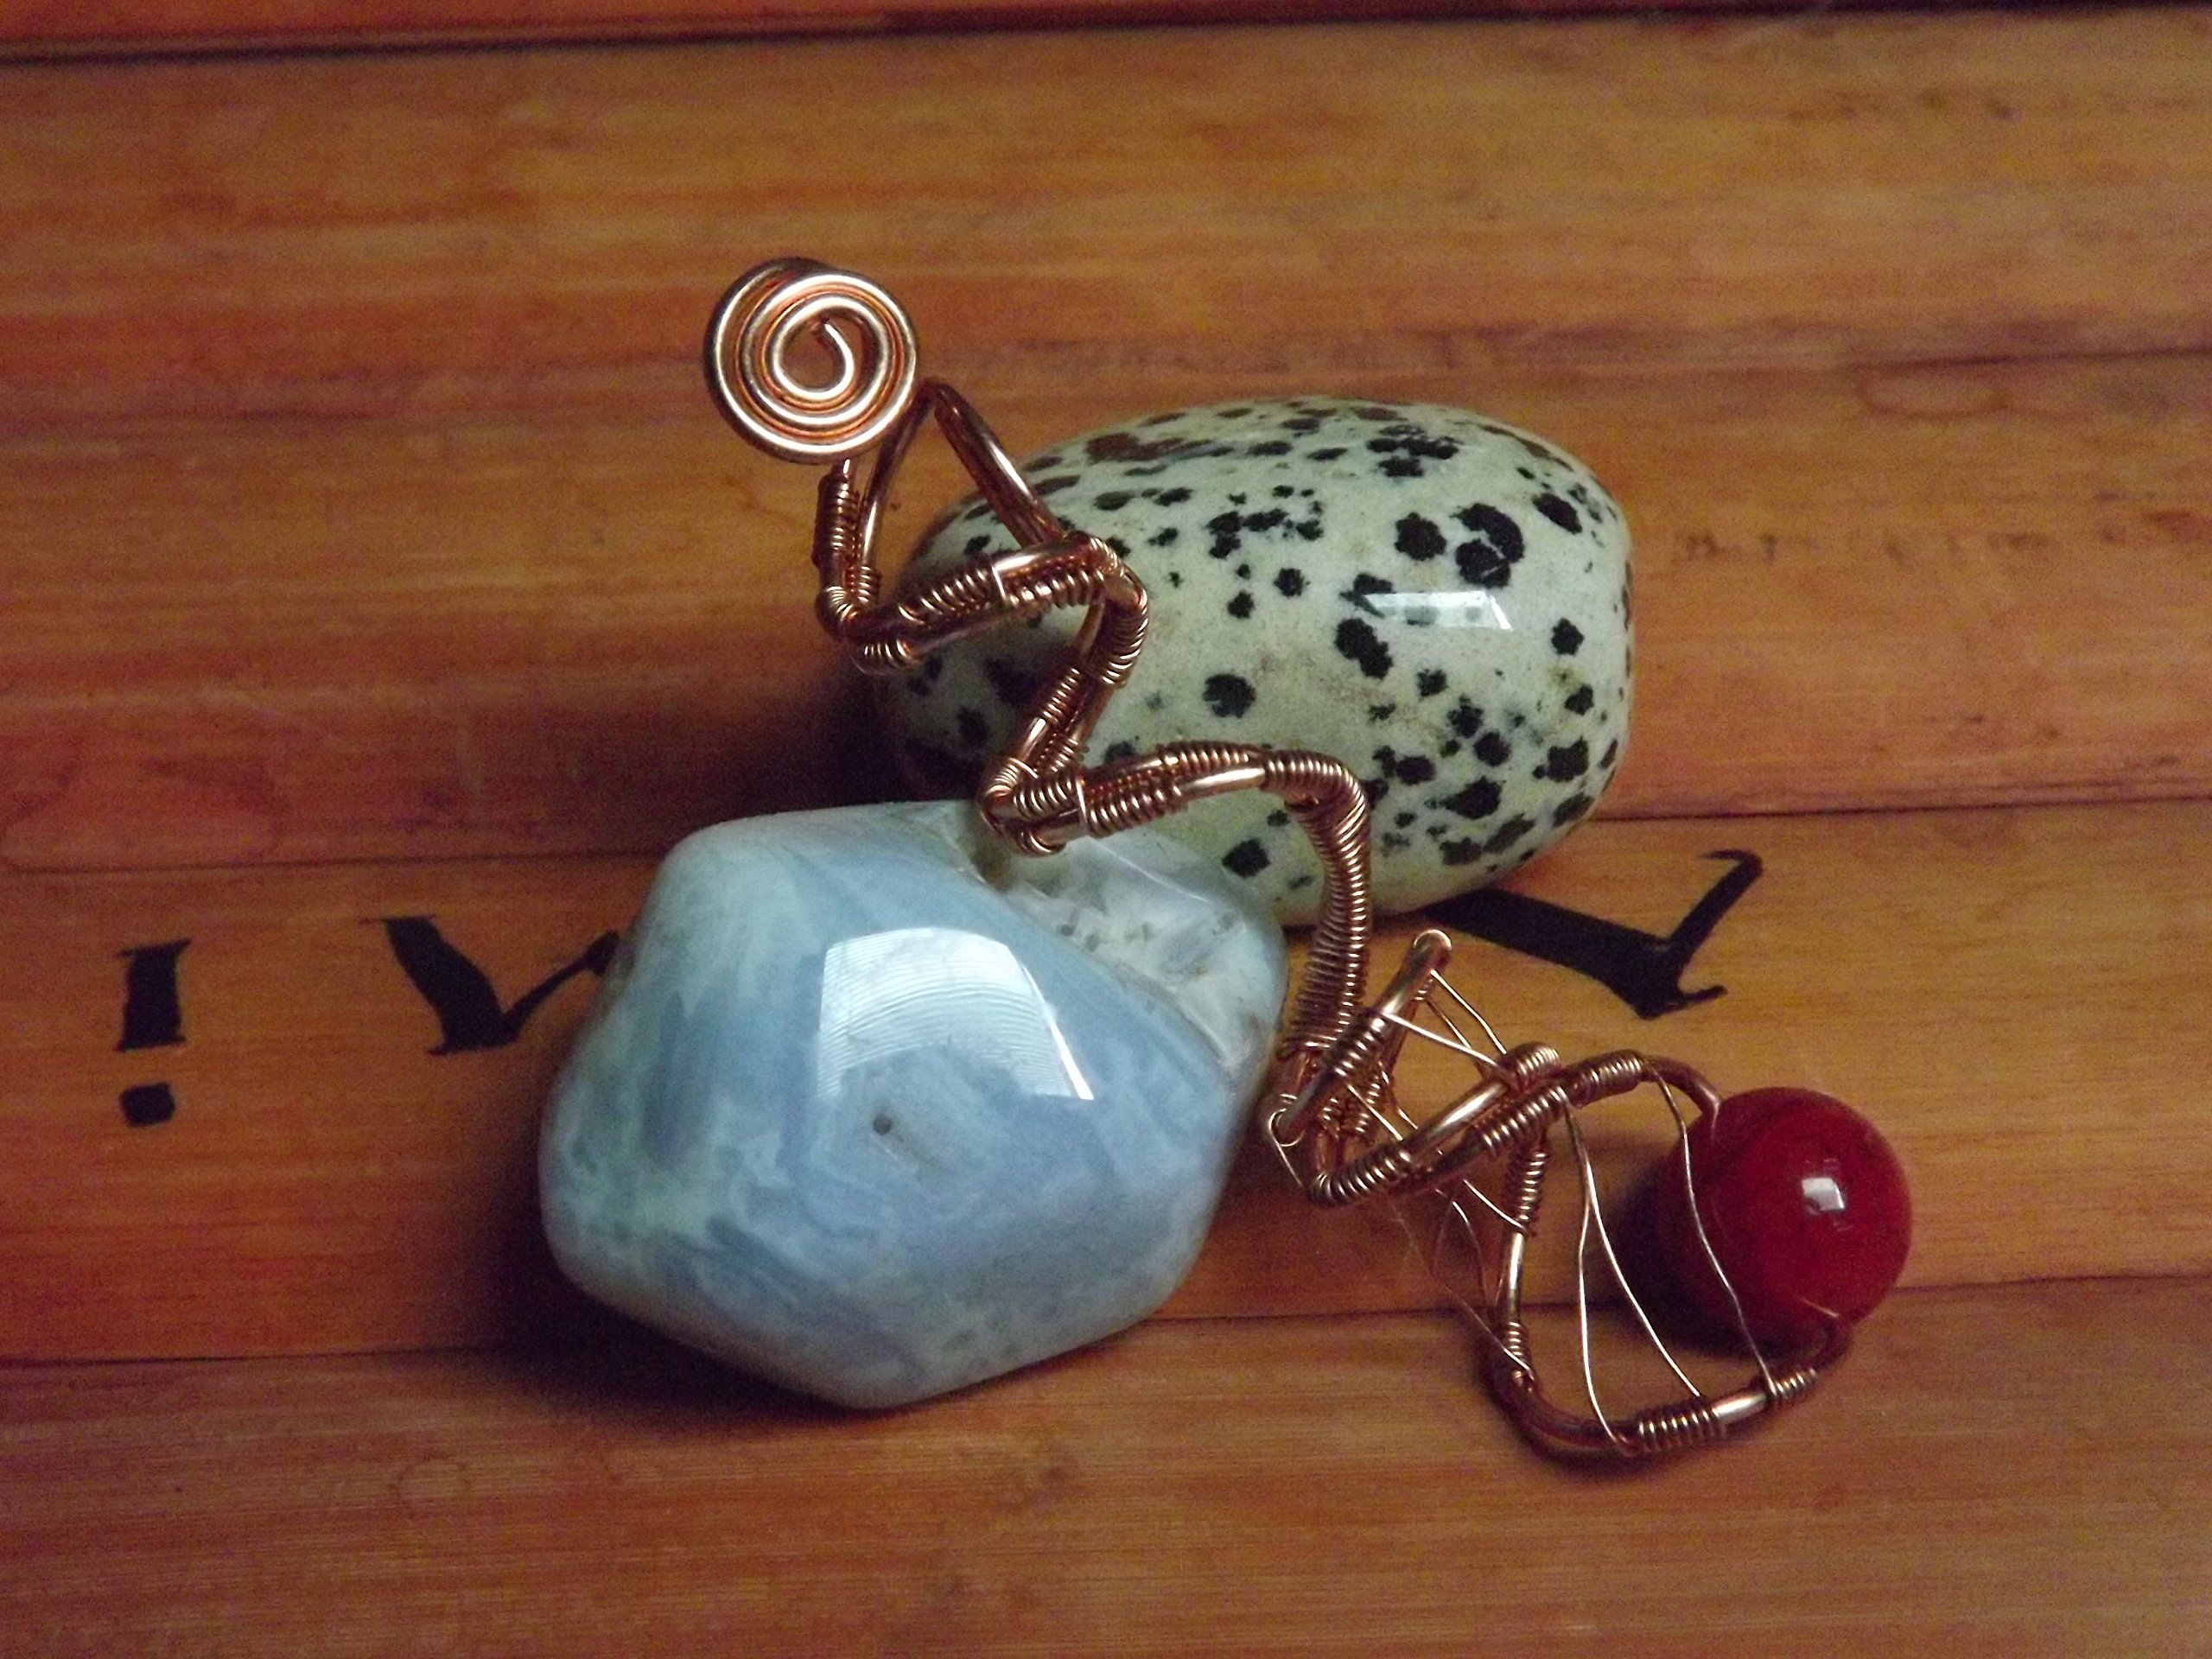 Works of the Nile Loc Jewelry Hair Jewels Dreadlock Bead Loc Adornment Healing Stones Viking Hair Bead